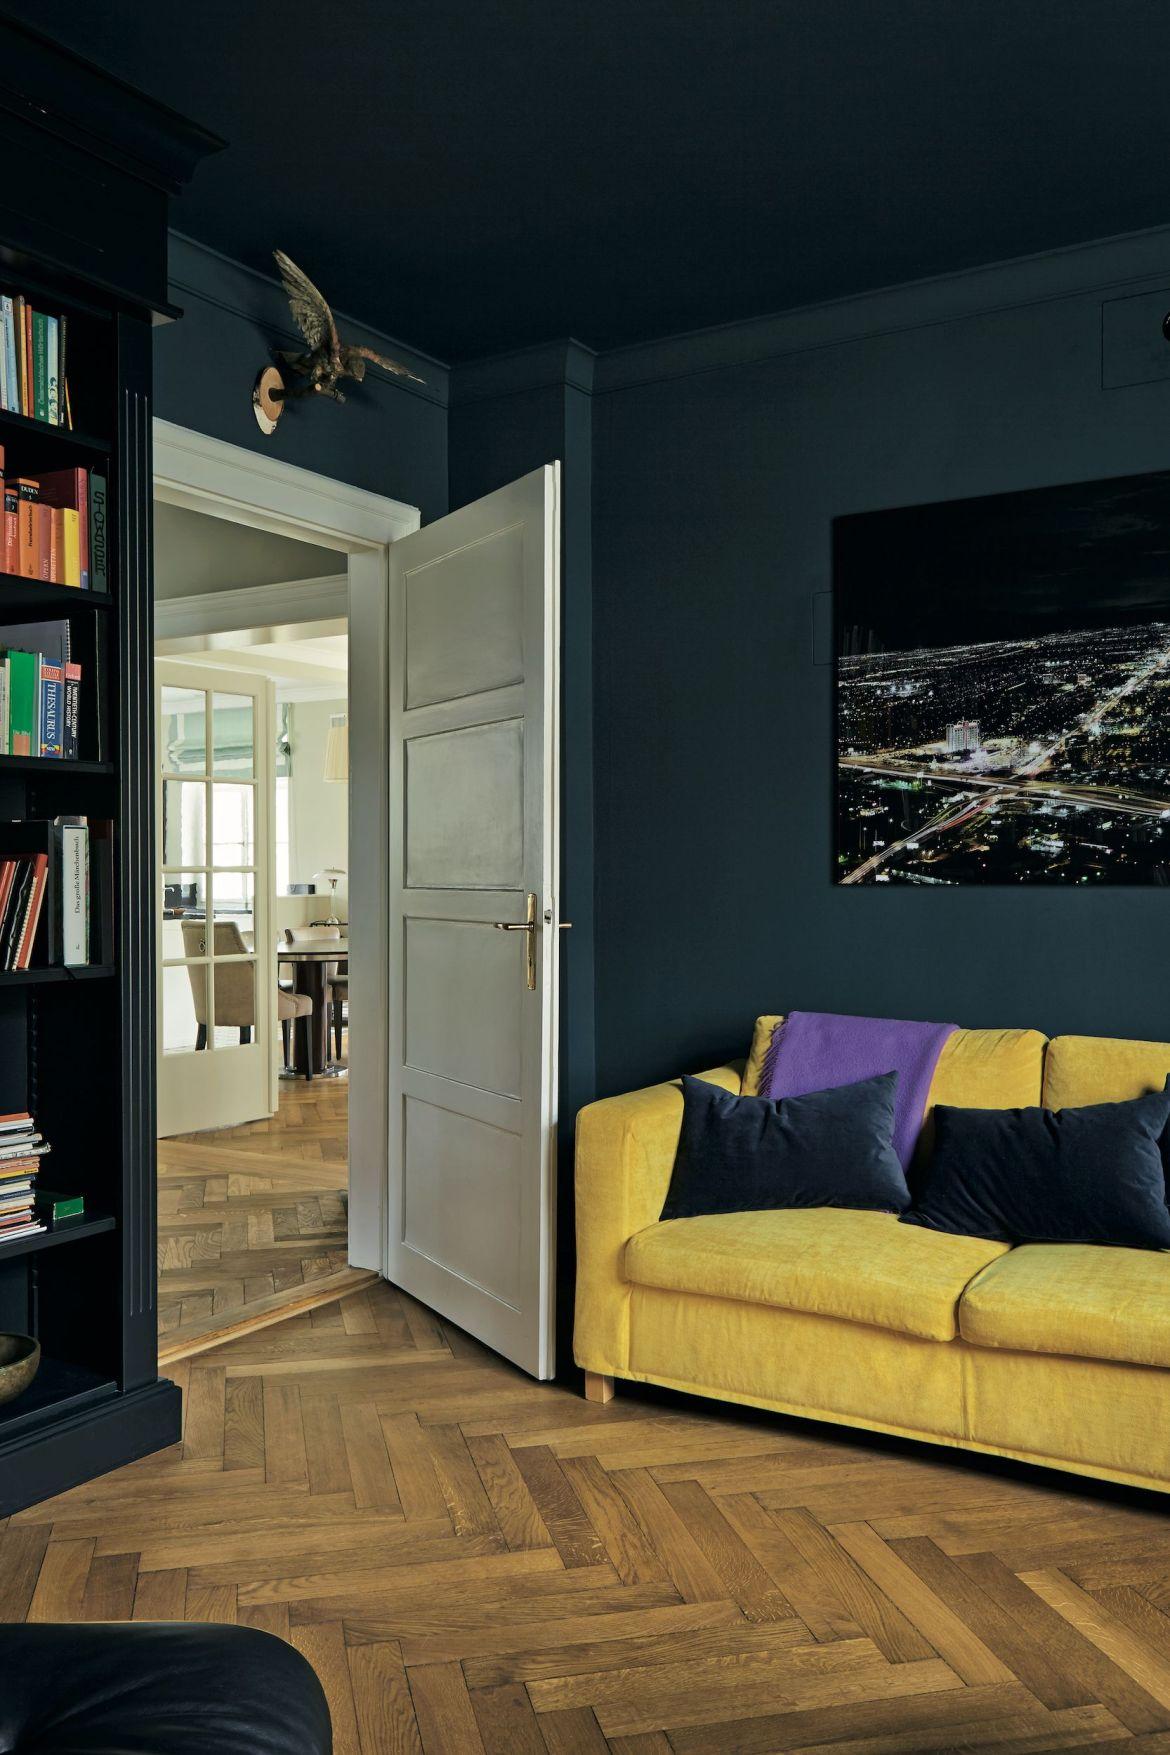 farrow and ball's hague blue, living room